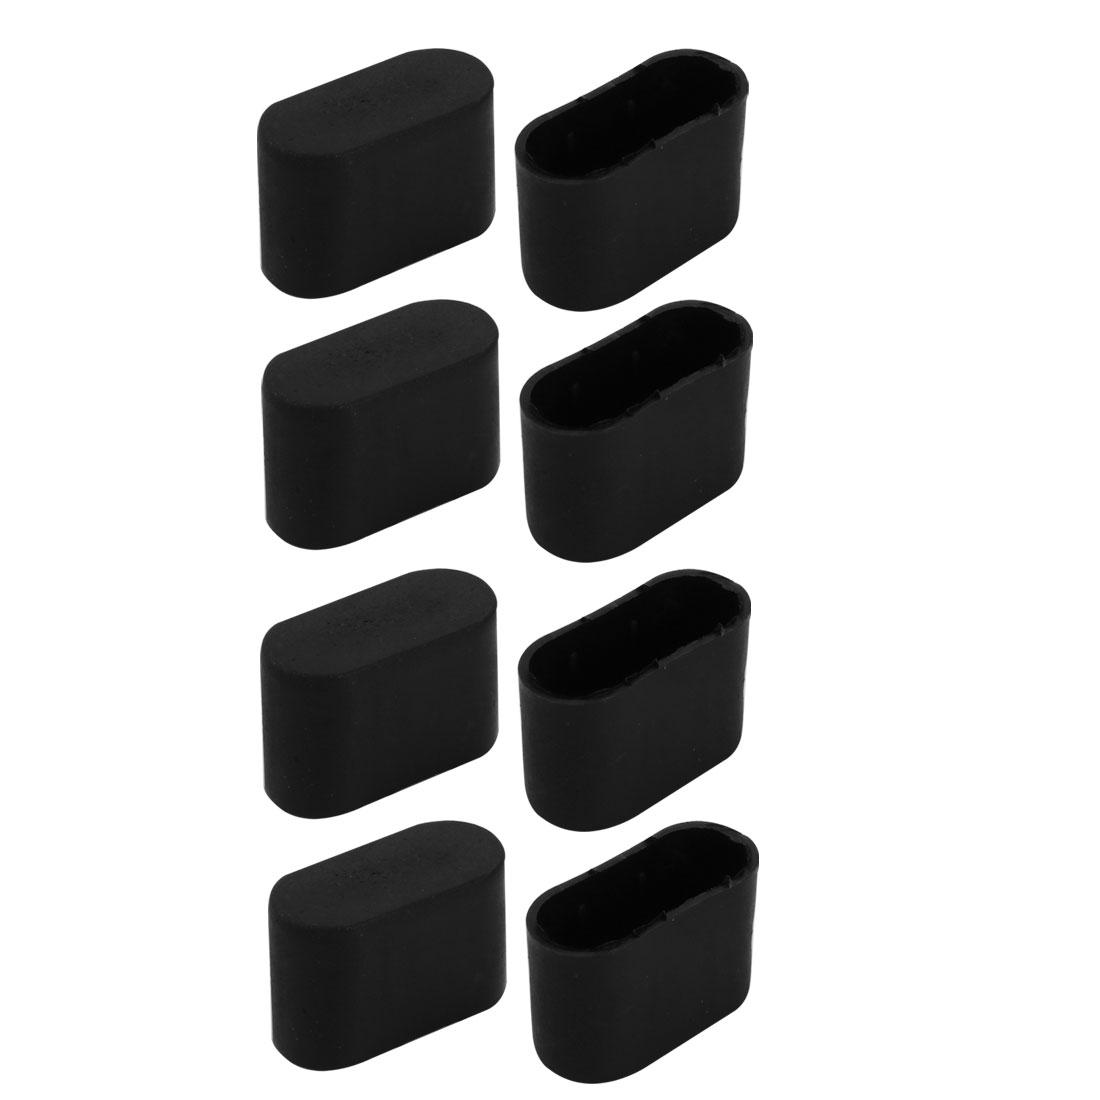 8pcs Furniture Desk Chair Foot Oval PlasticTip Cap Fit for 34mmx14.5mm Leg Black